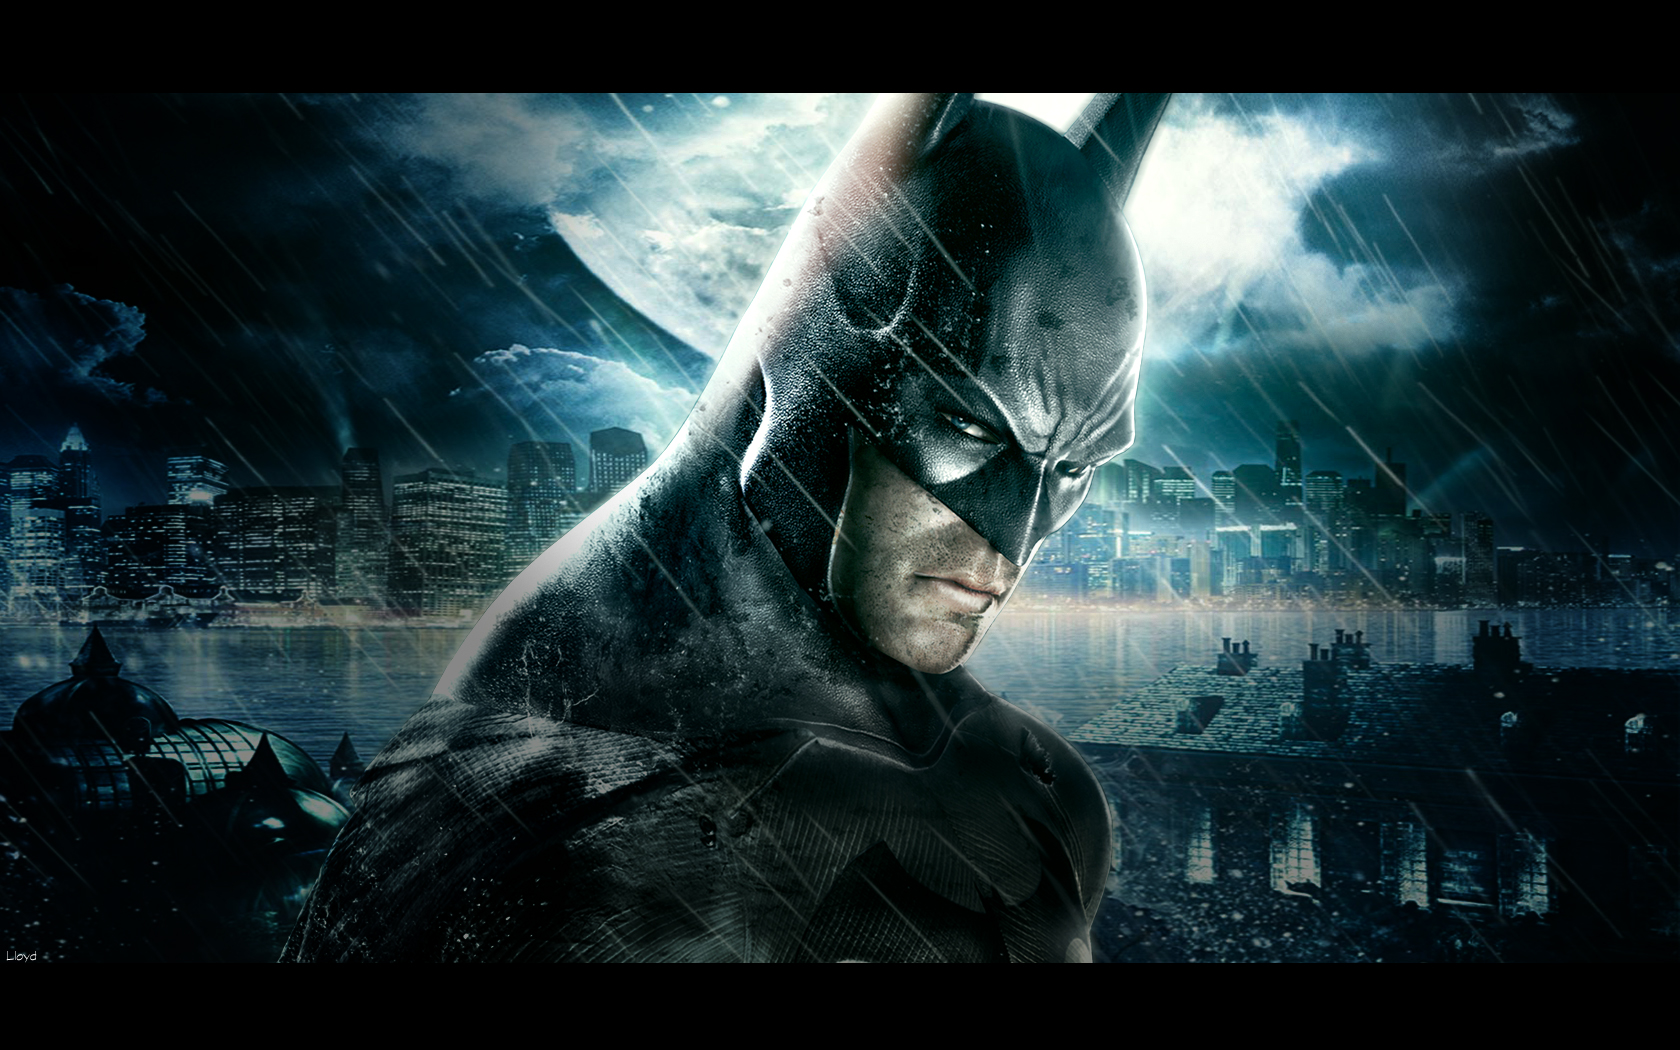 Batman Arkham Asylum Wallpaper By Igotgame 1680x1050 pixel City HD 1680x1050